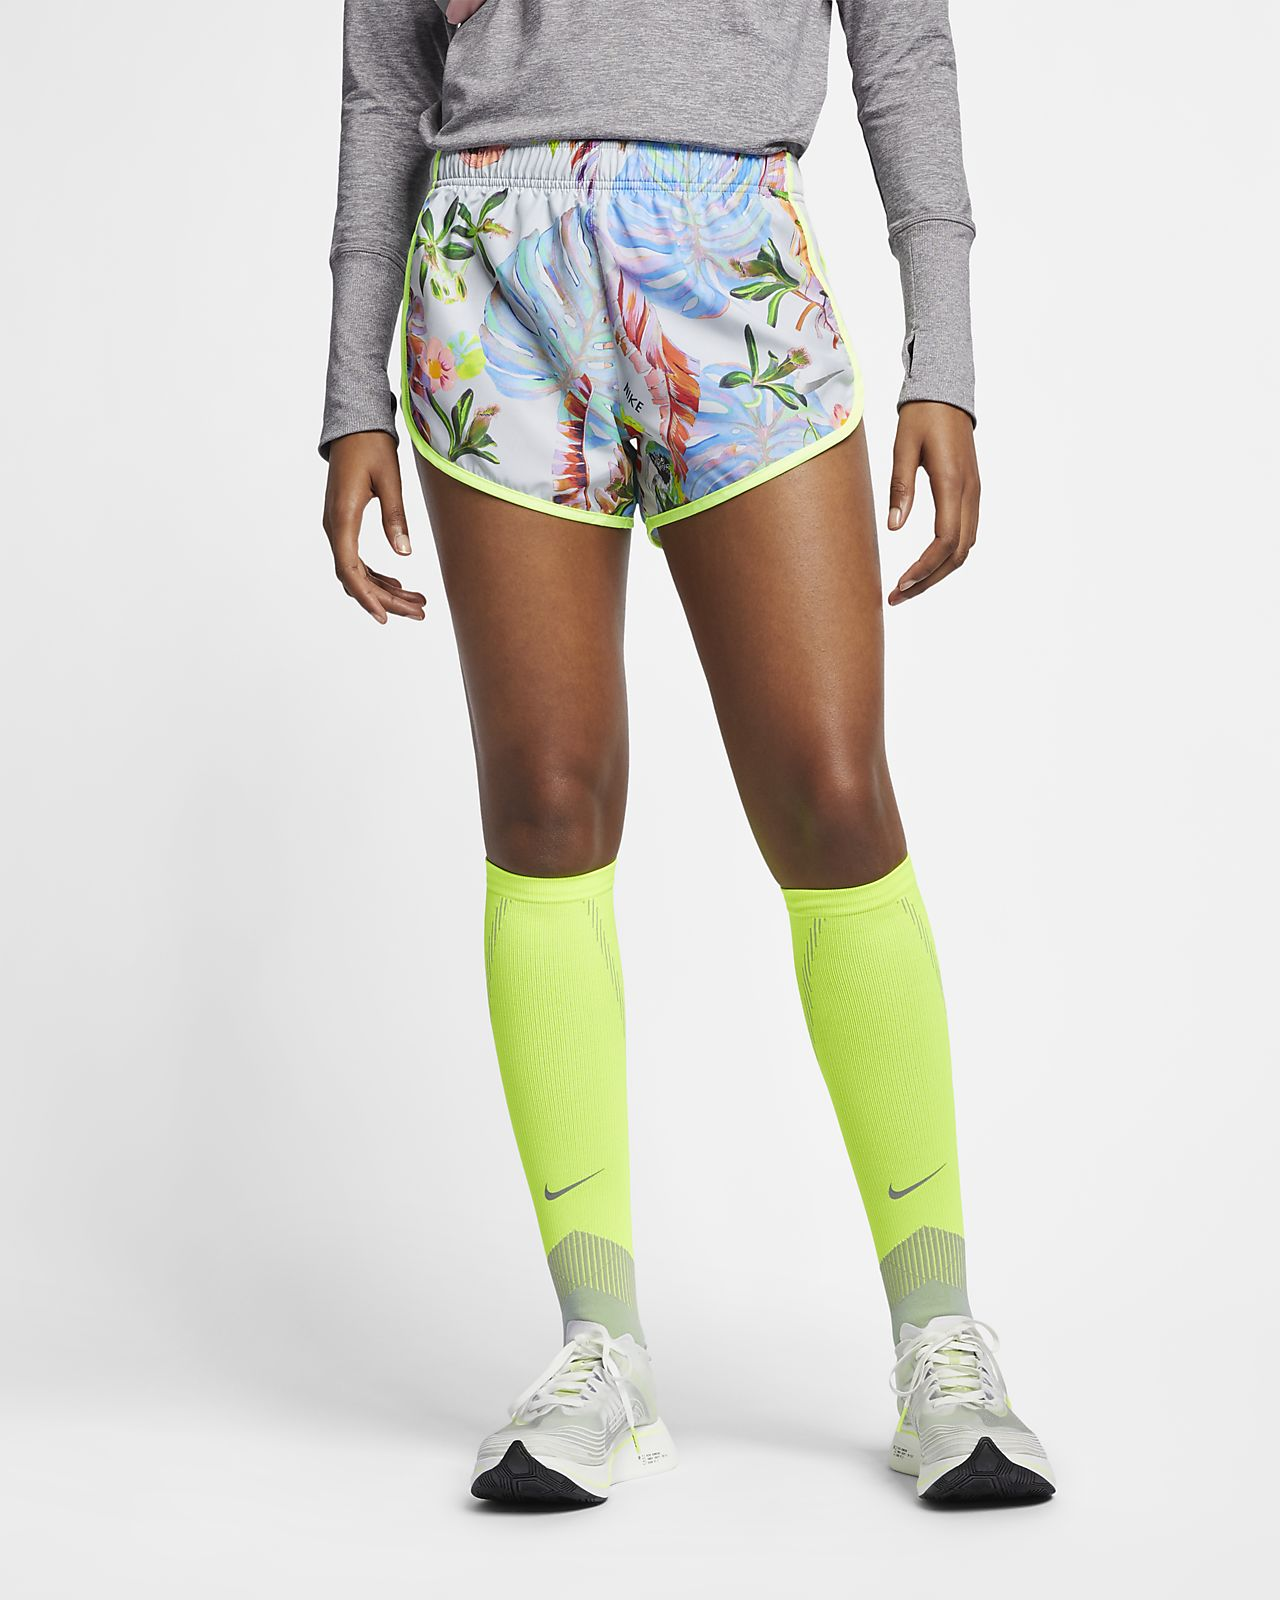 7e622d03e5d Nike Tempo Women s Printed Running Shorts. Nike.com AE